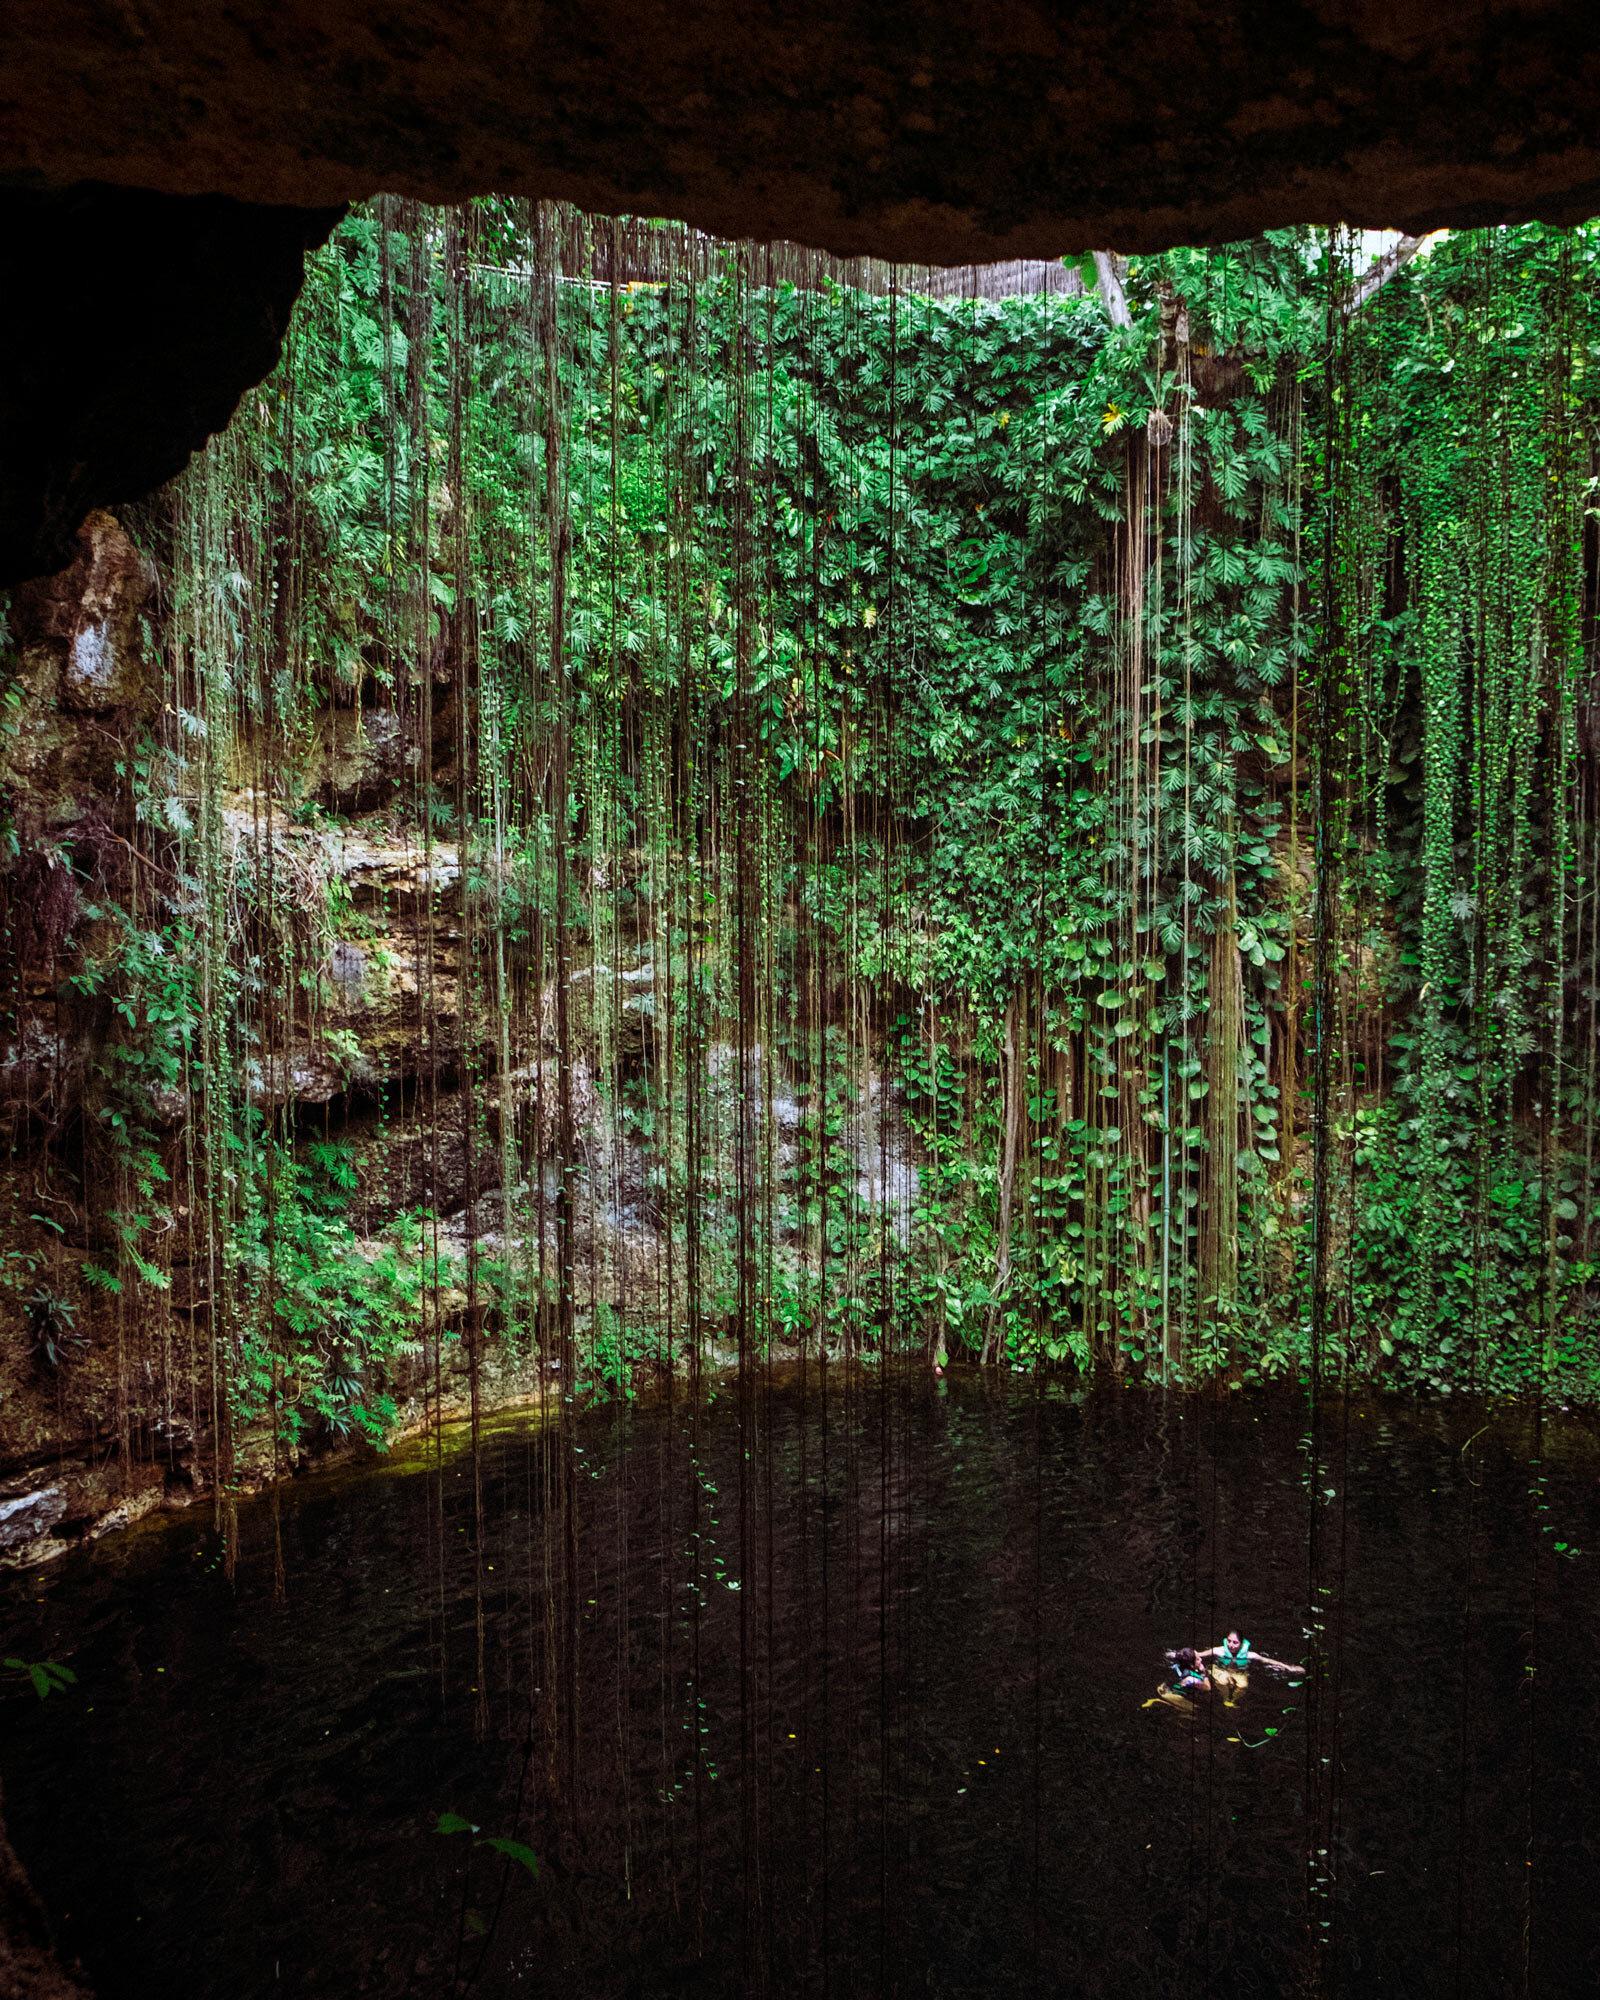 Rachel Off Duty: A Cenote in Mexico